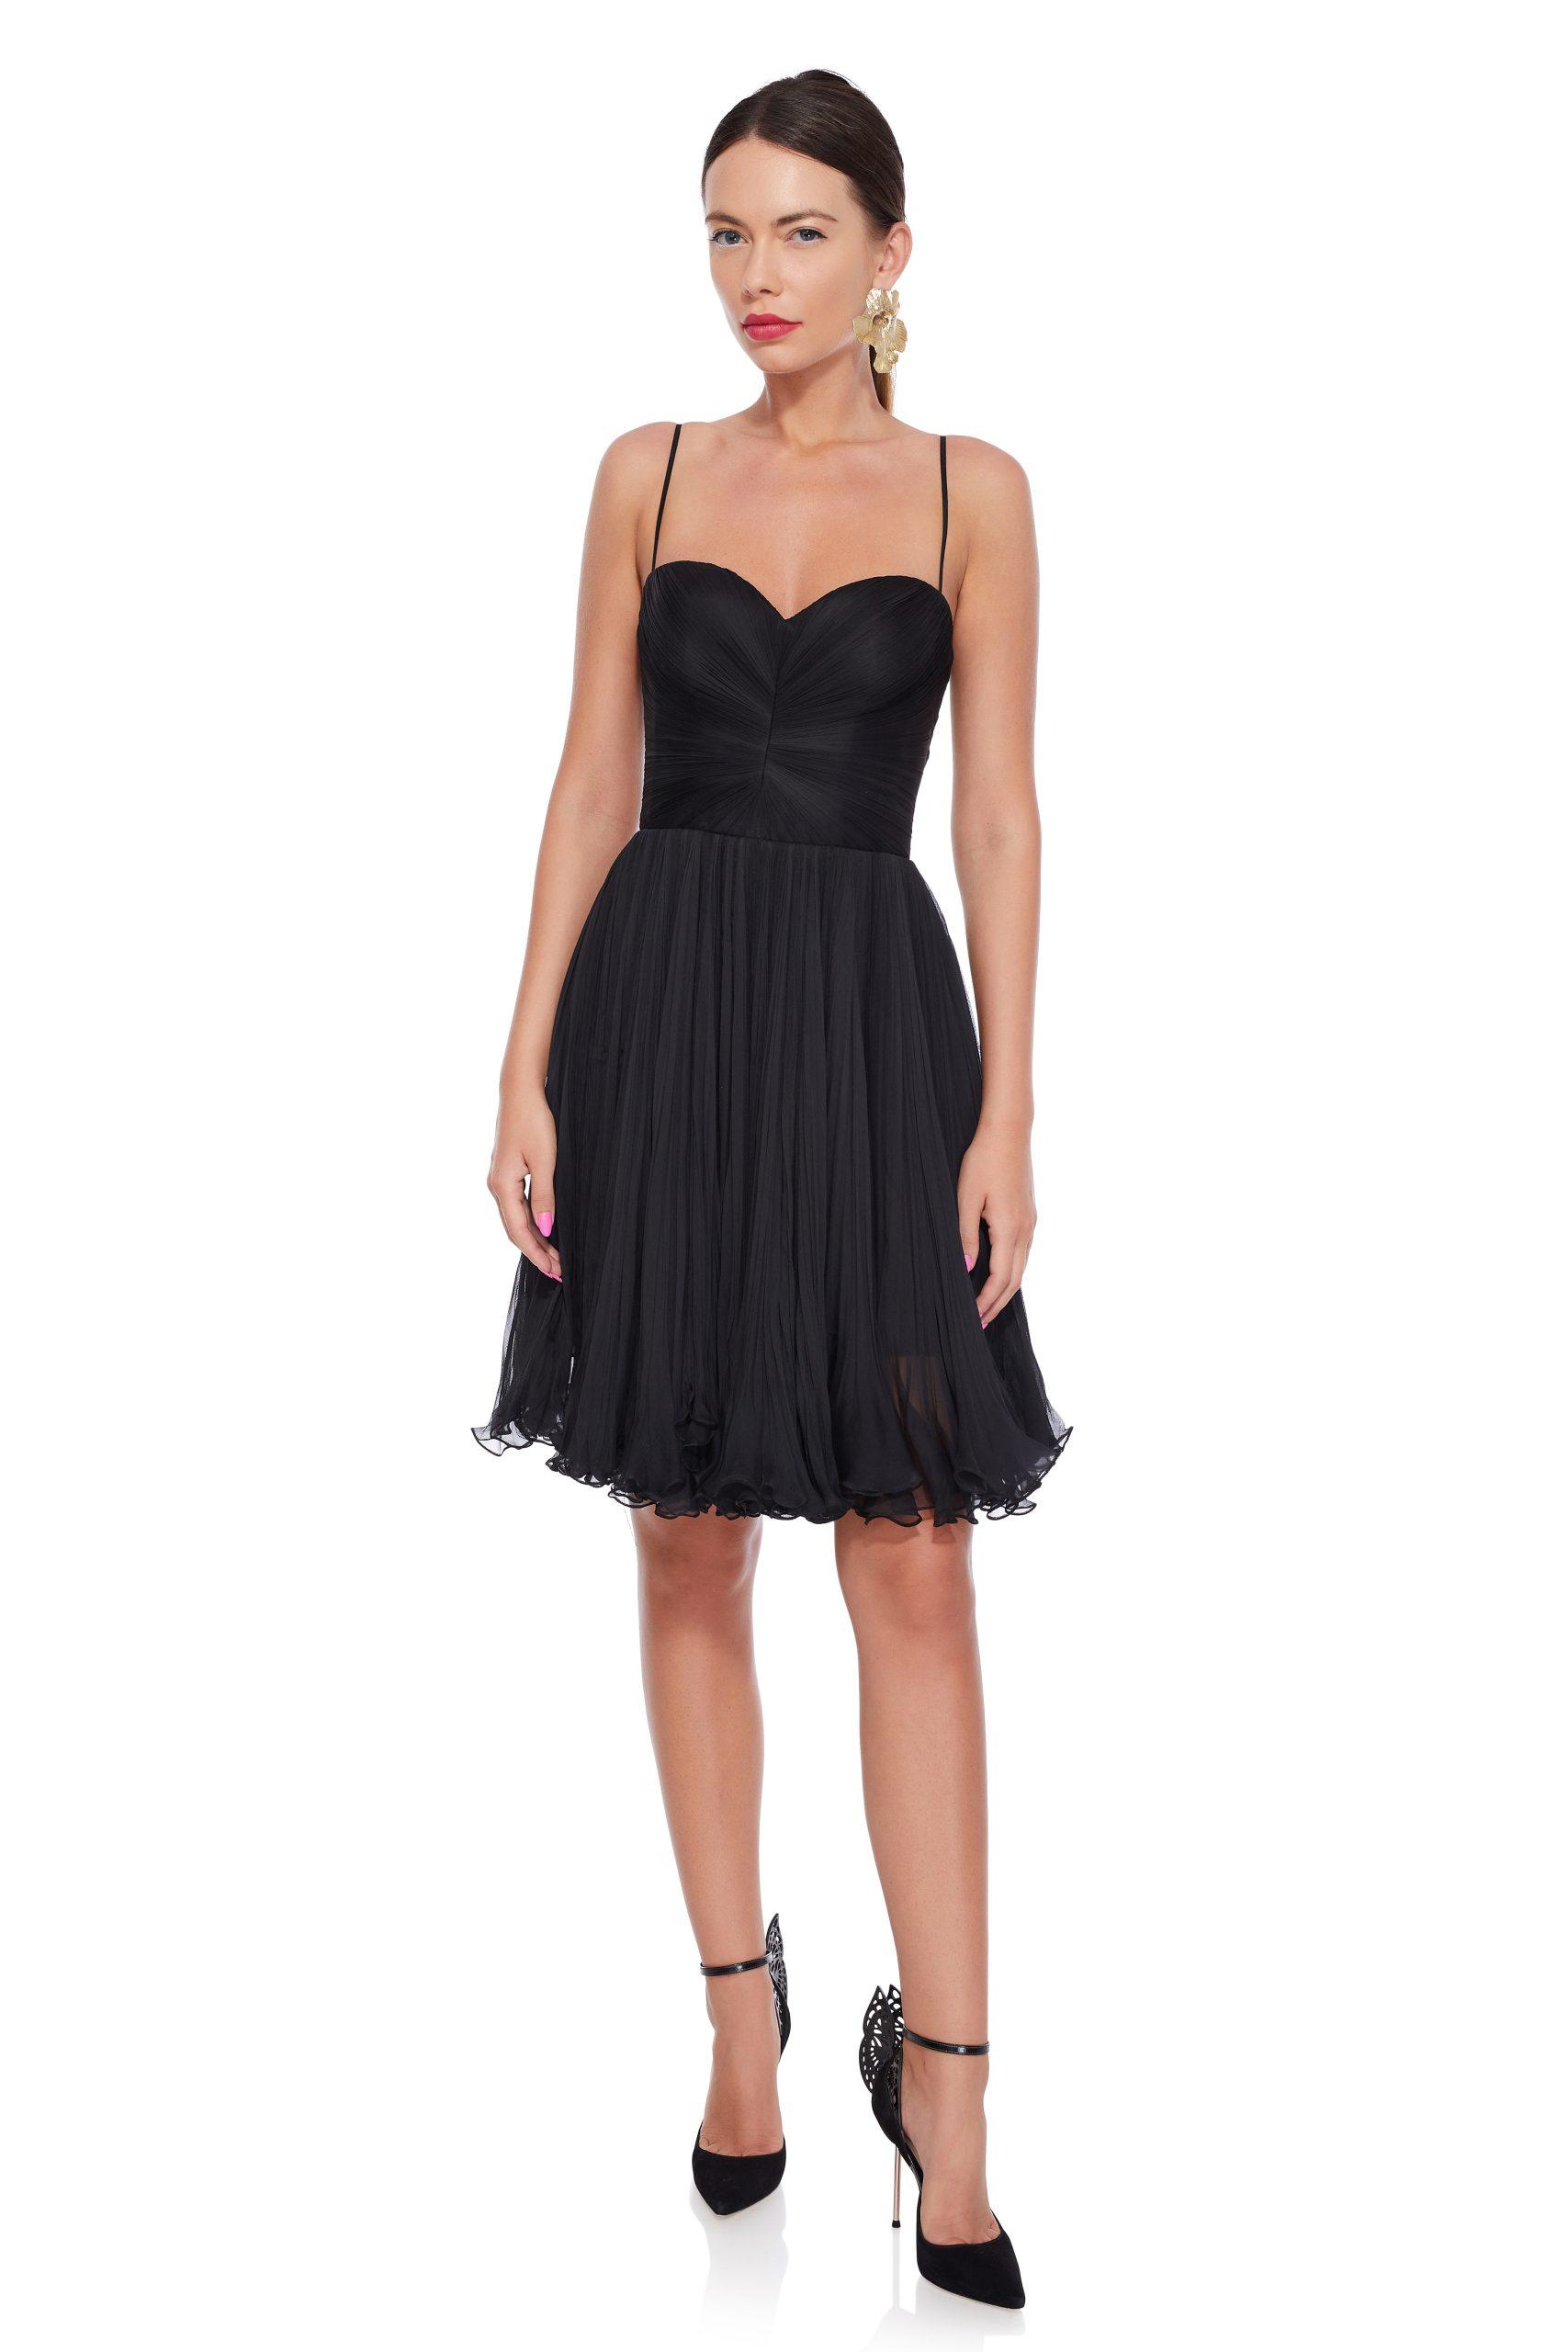 Black silk cocktail dress